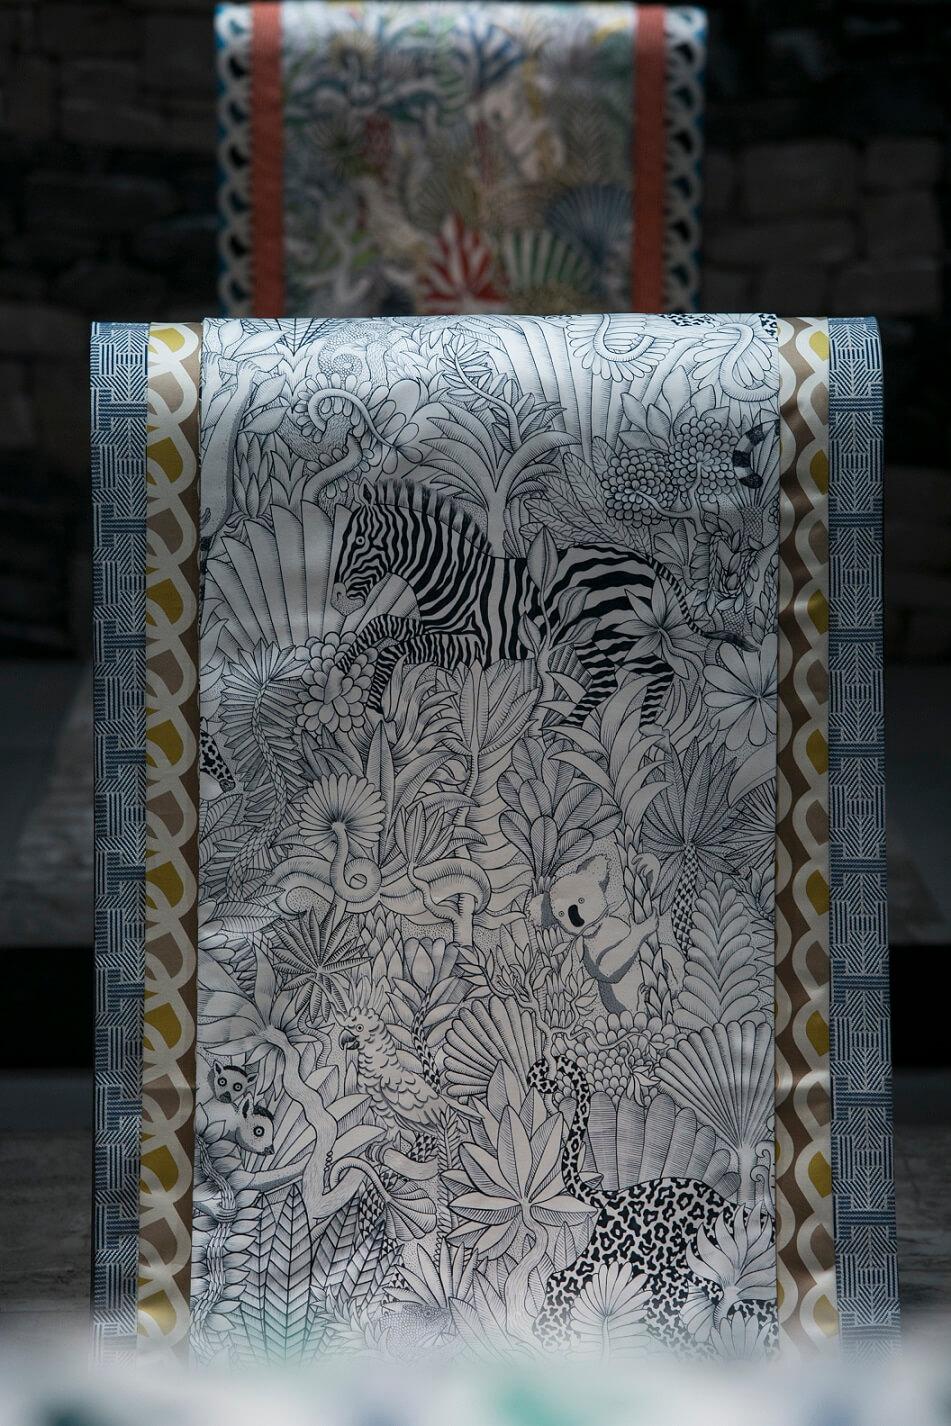 Animaux Camoufles圖案,集合了不同熱帶地區的動植物。